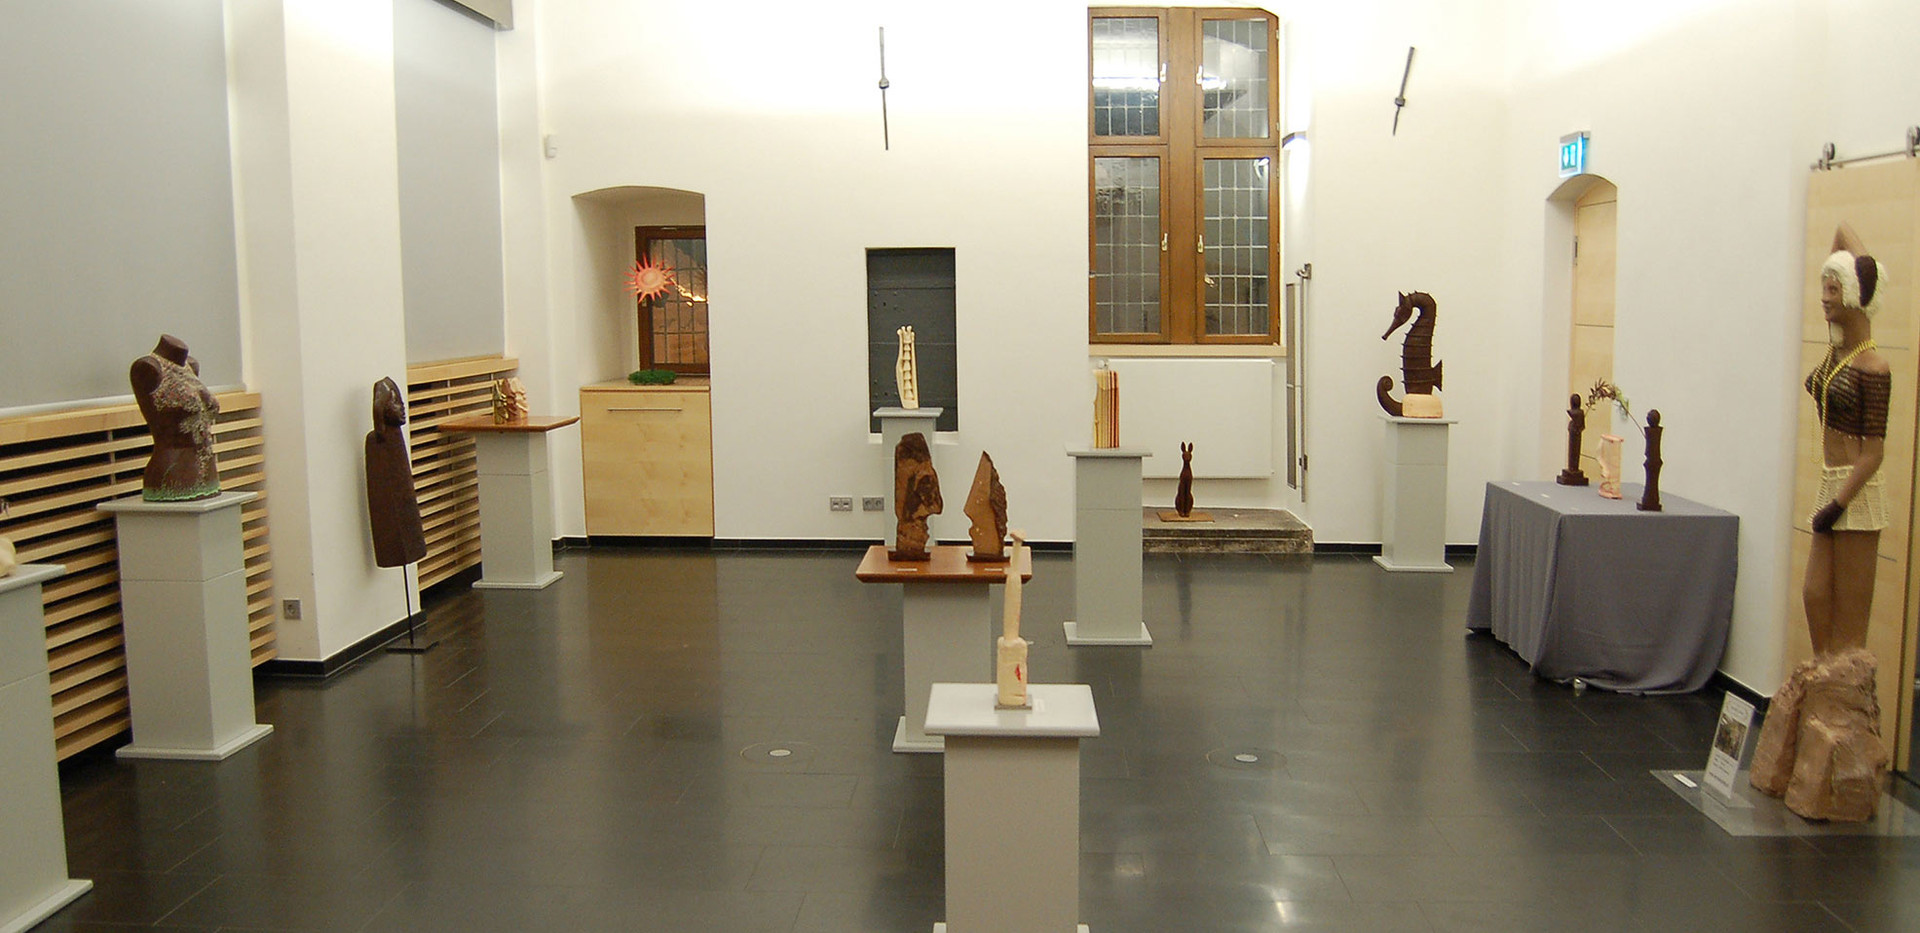 Exhibition-City of Paderborn